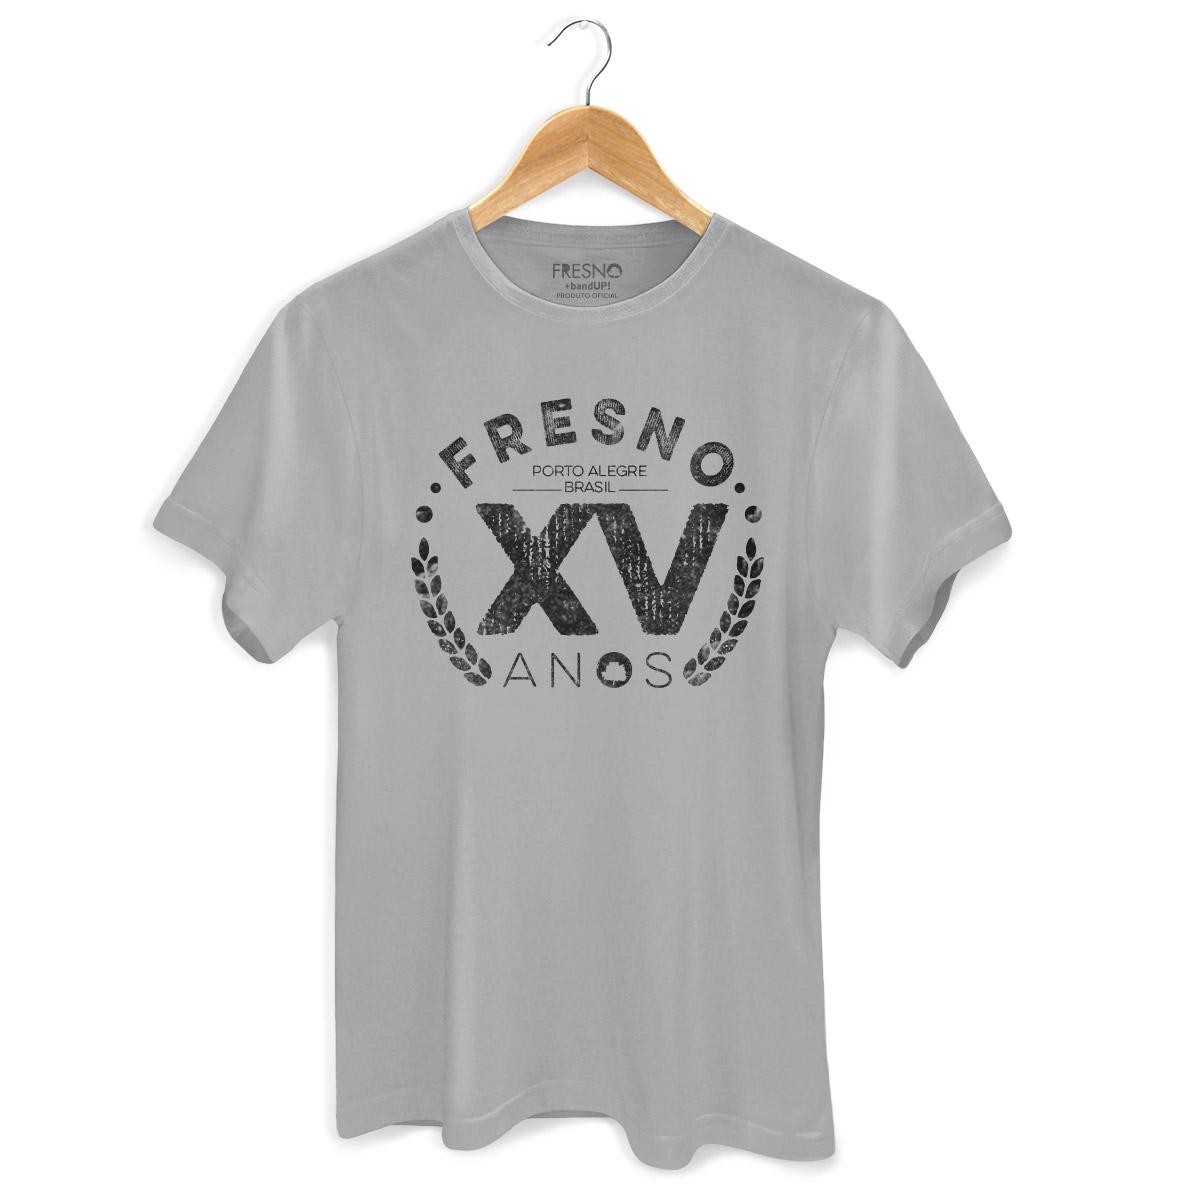 Camiseta Masculina Fresno 15 Anos Gray